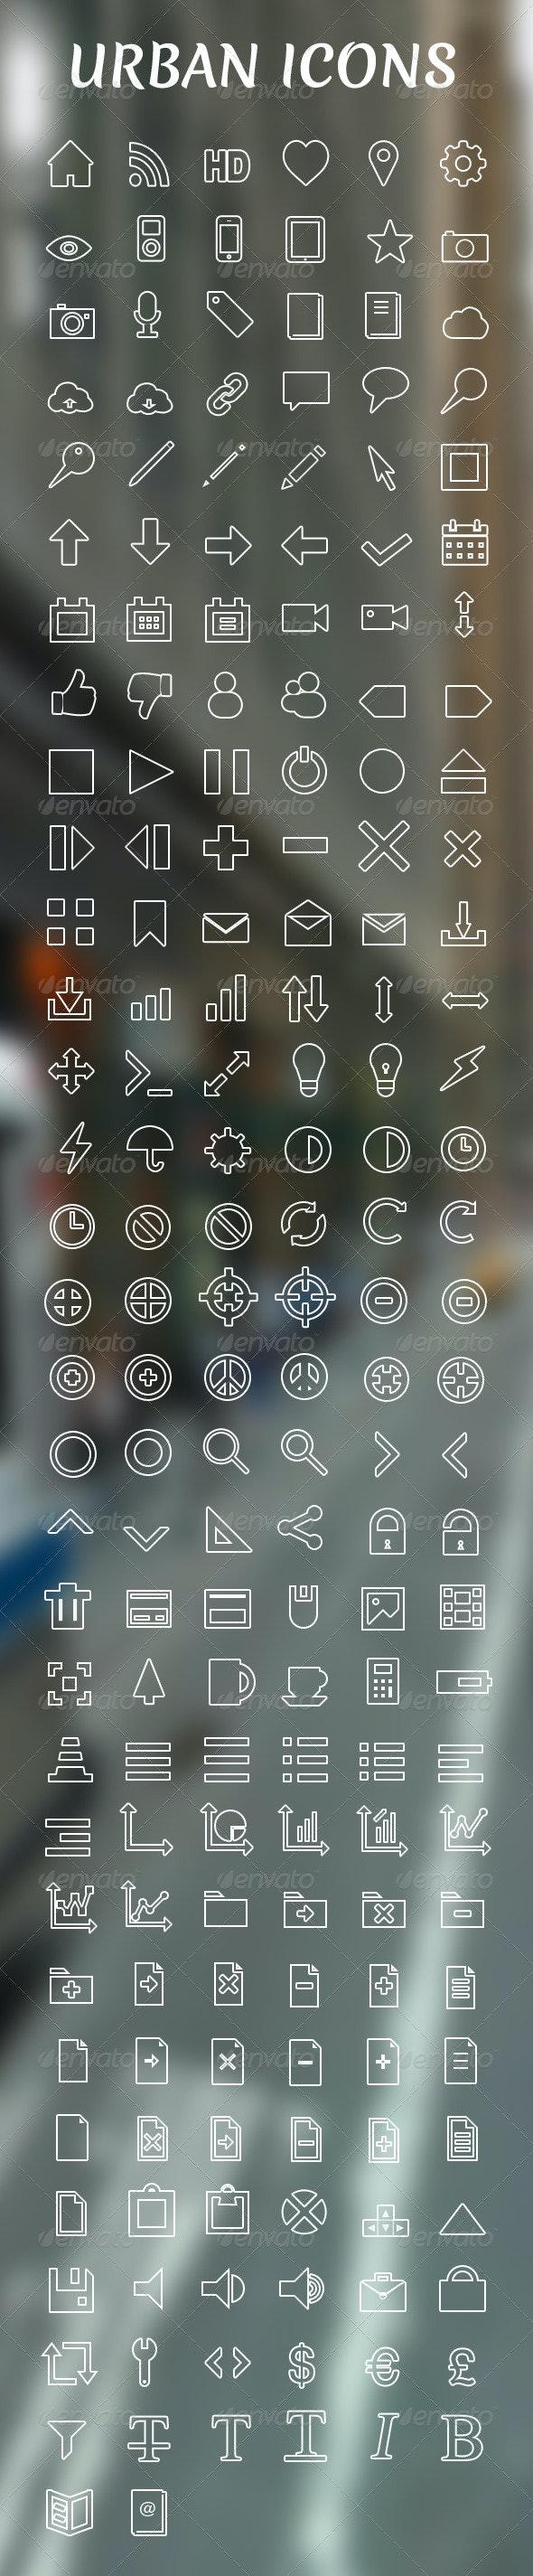 Urban Icon Set - 188 Vector Icons - Web Icons